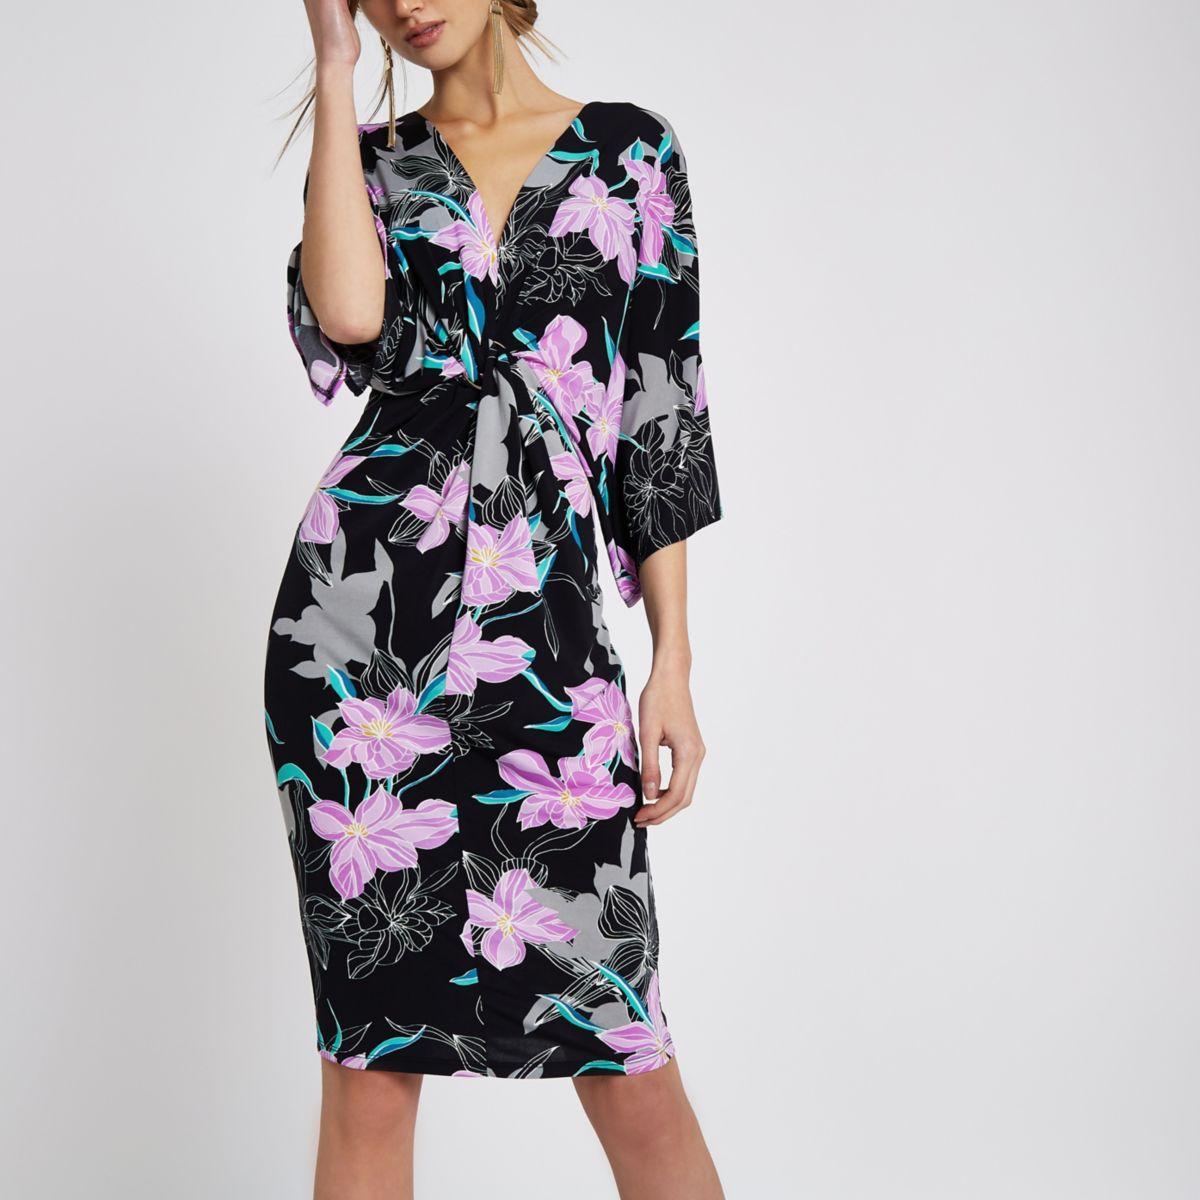 Black floral print batwing sleeve midi dress